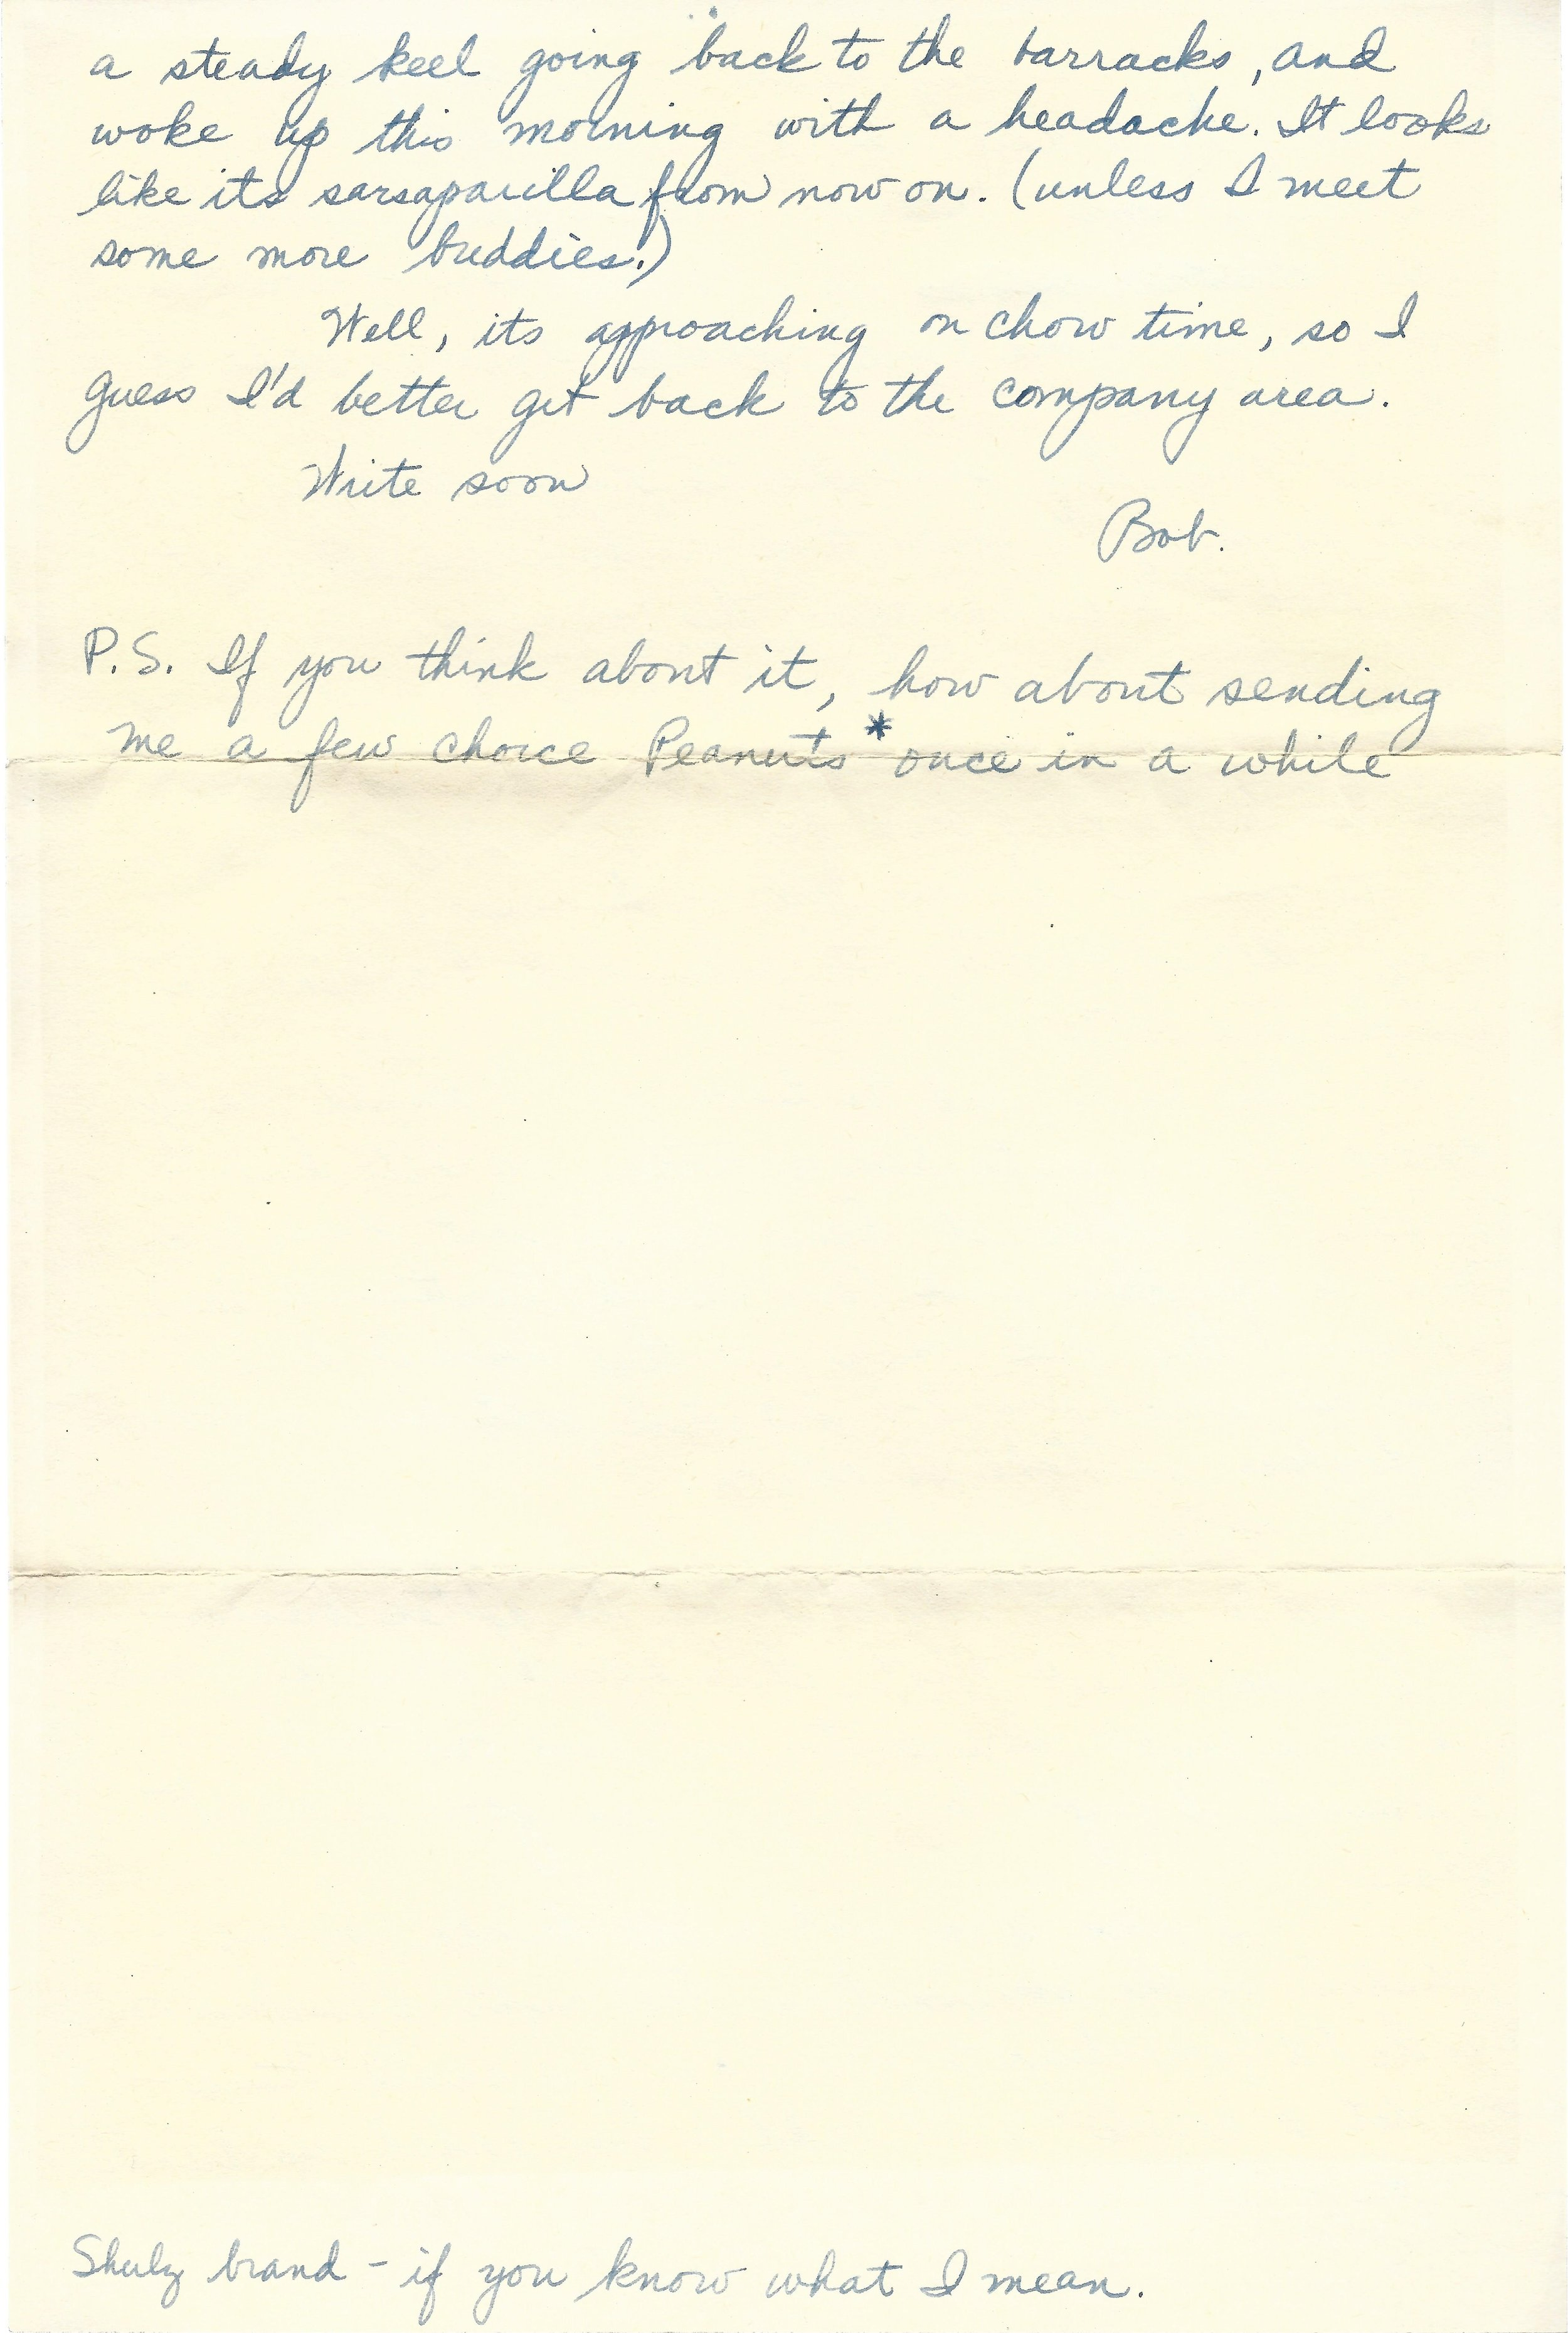 6. Oct. 19, 1952 (Opa)_Page_5.jpg